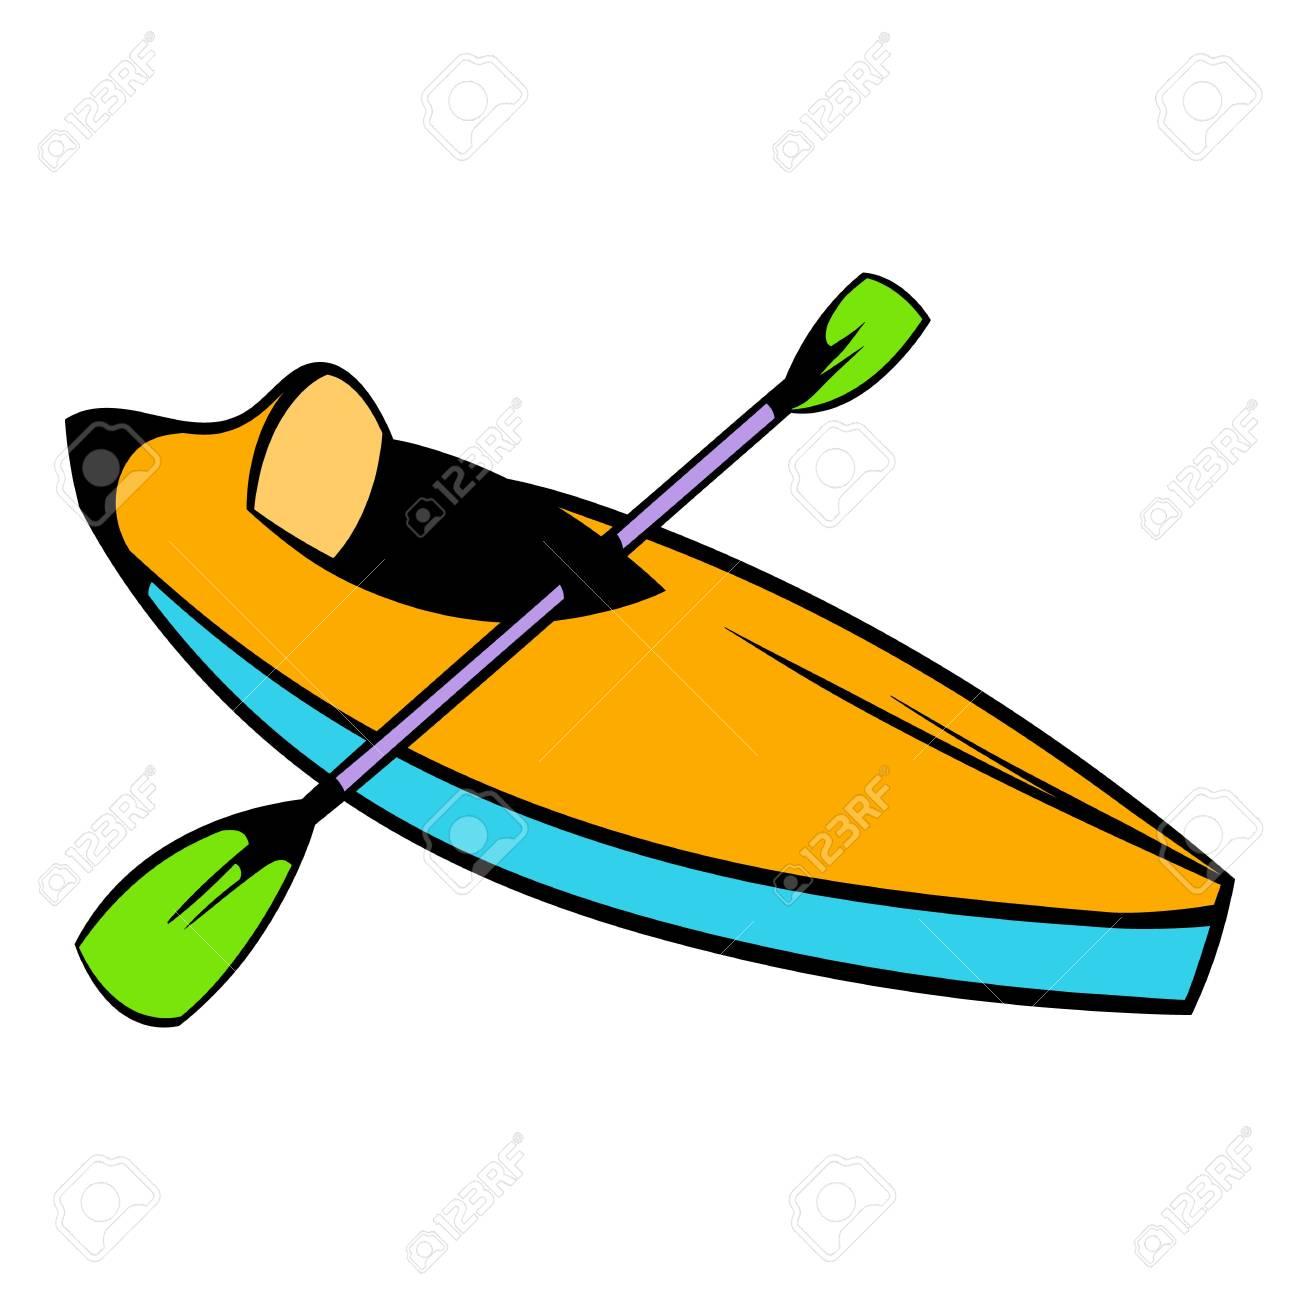 Kayak icon, icon cartoon » Clipart Station.